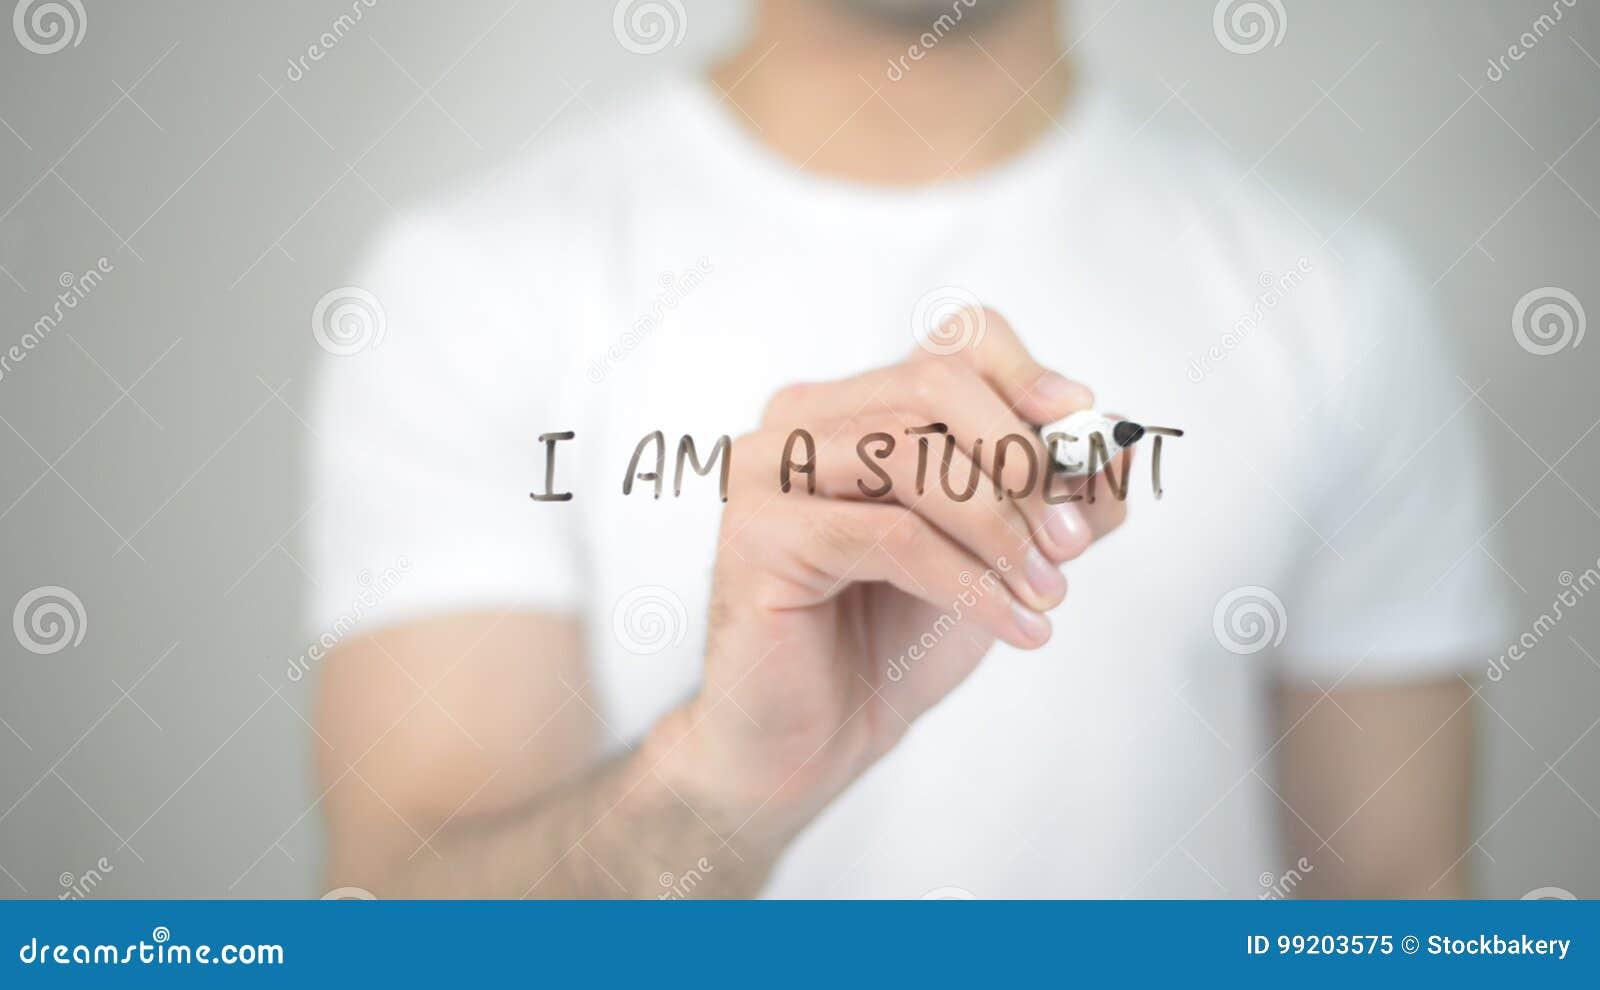 I am a Student, man writing on transparent screen